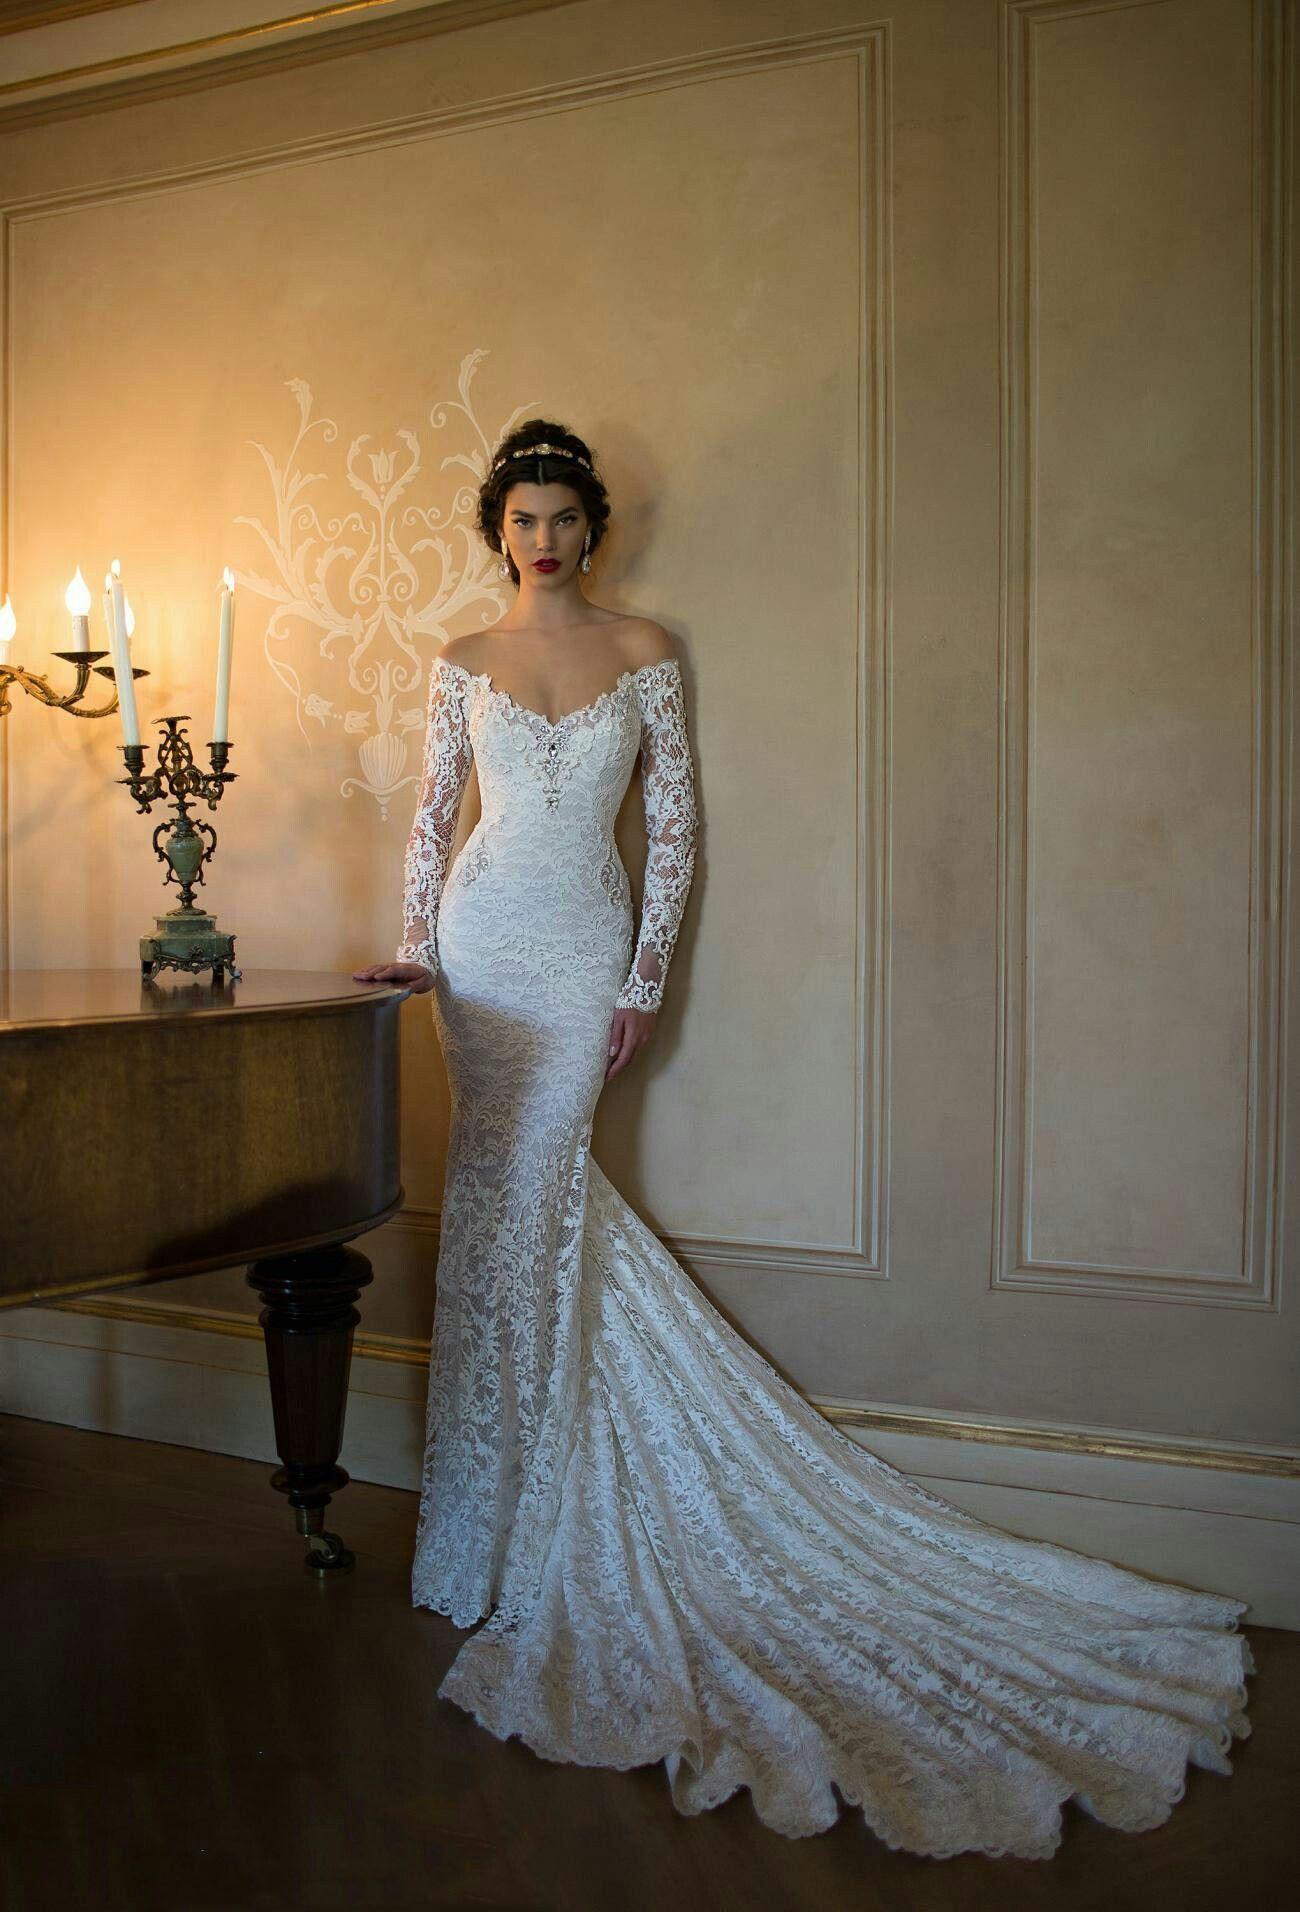 Long sleeve lace wedding dress mermaid  Off the Shoulder V Neck Crystal Detailling Lace Mermaid Wedding